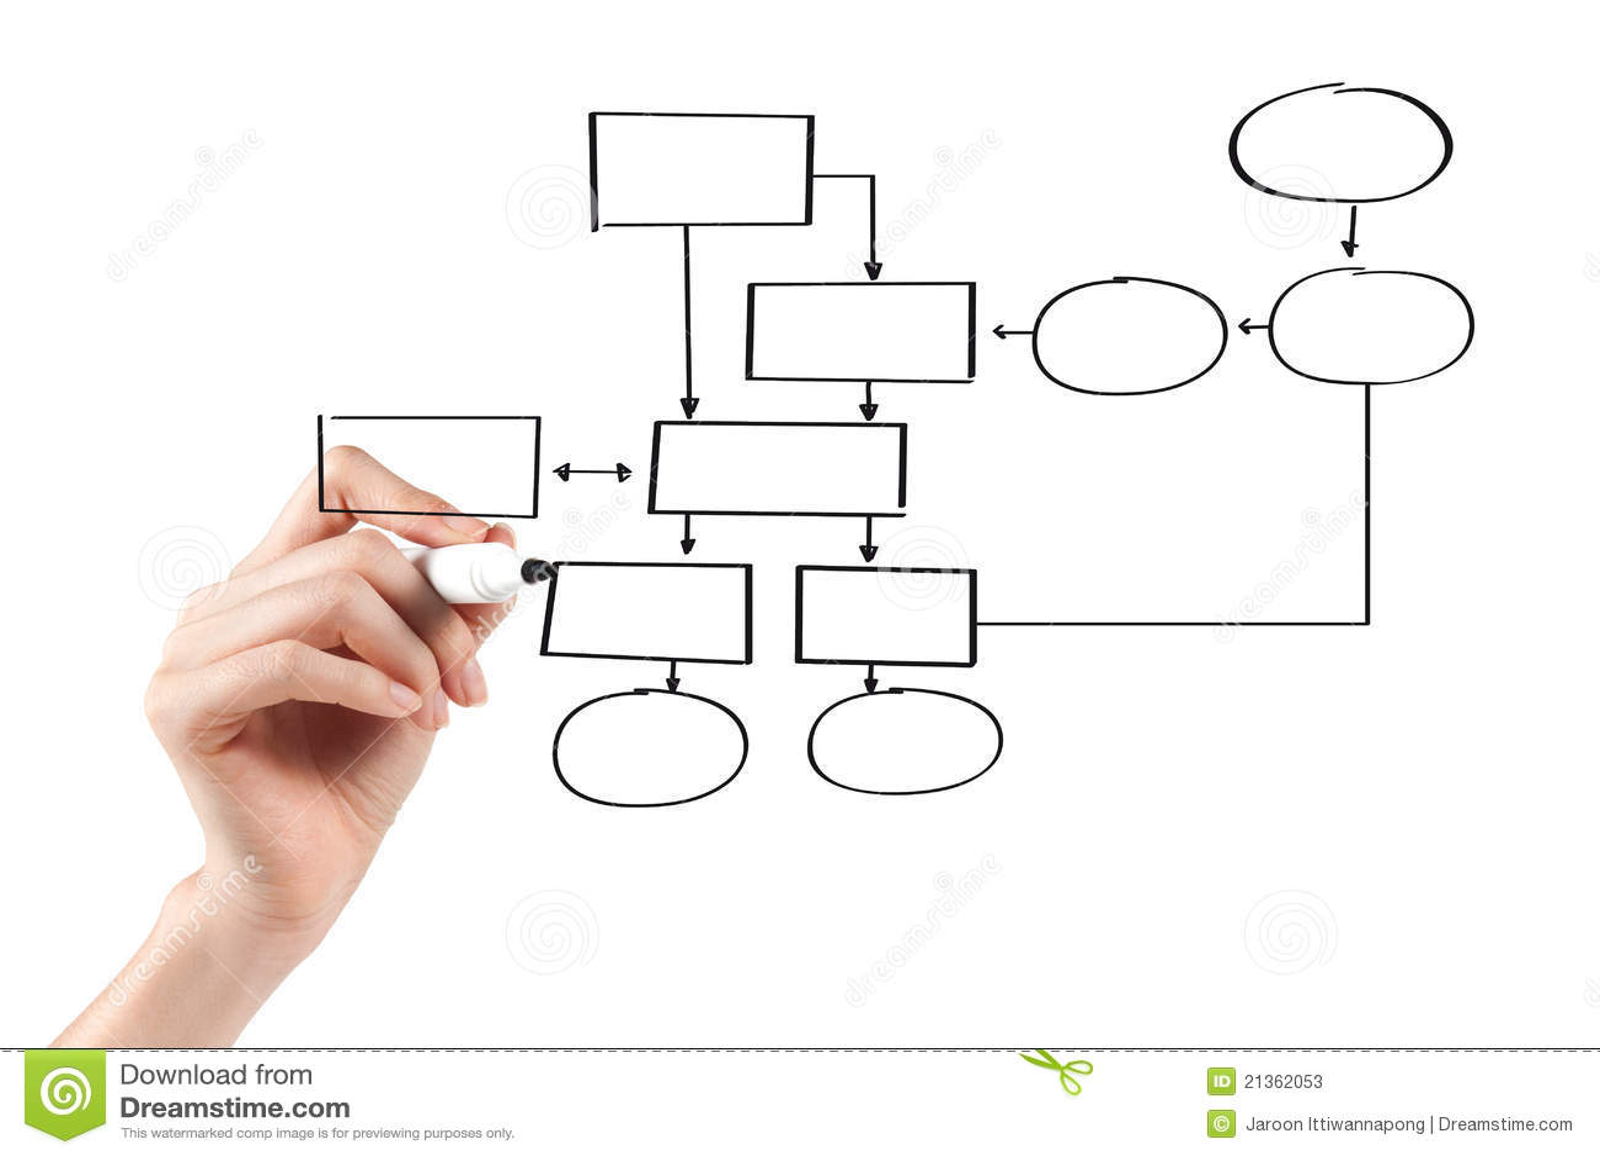 HAND DRAWING A BLOCKDIAGRAM ROYALTY FREE STOCK PHOTOS IMAGE ... on skandic wiring-diagram, suzuki wiring-diagram, 1980 moto-ski wiring-diagram, murray wiring-diagram, simplicity wiring-diagram, mercedes-benz wiring-diagram, audi wiring-diagram, big dog wiring-diagram, 2007 outlander wiring-diagram, kawasaki wiring-diagram,